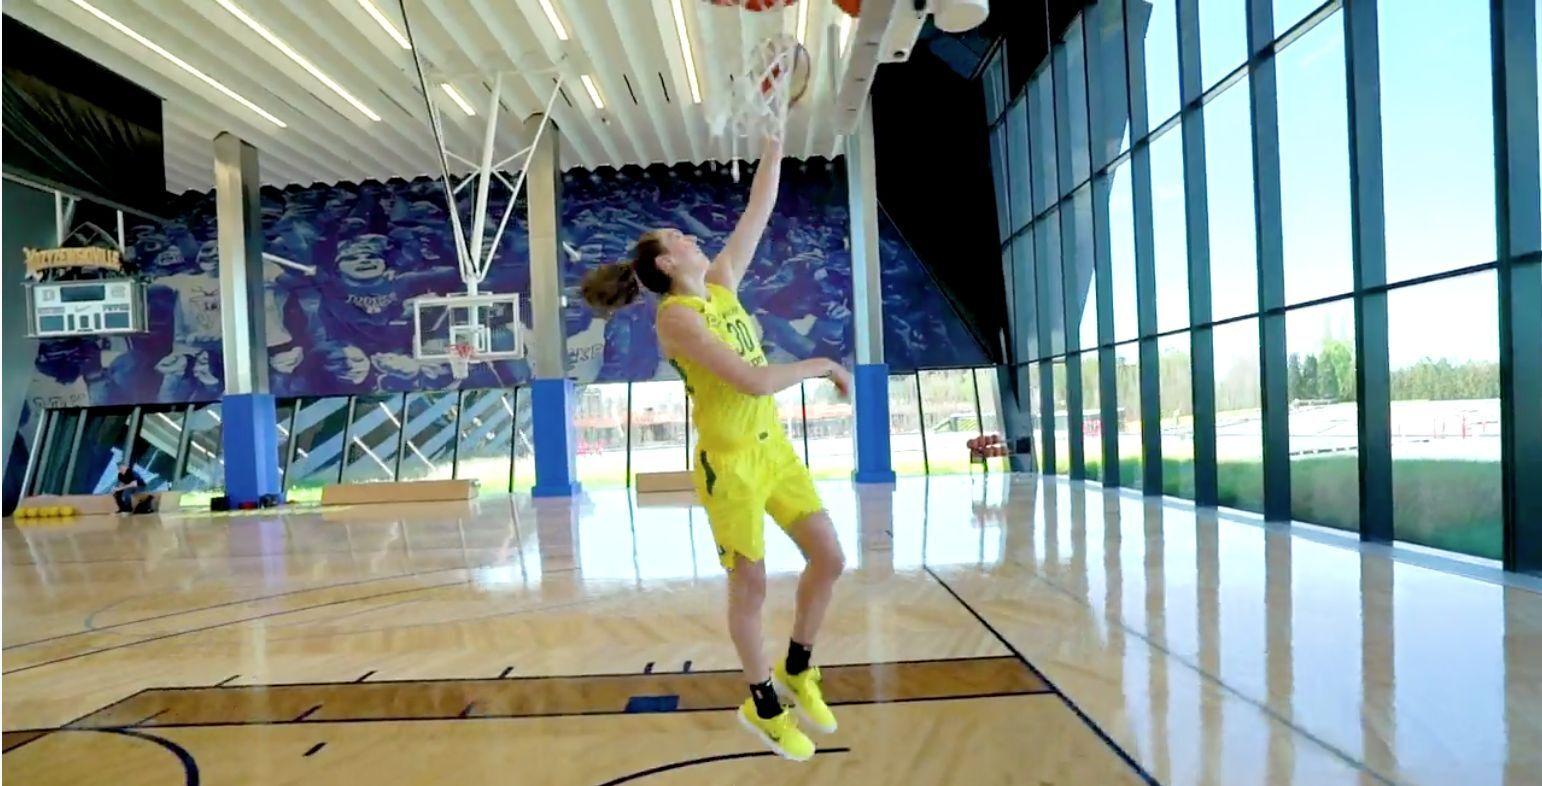 52b221febb0f27 WNBA unveils new Nike jerseys  A behind-the-scenes look